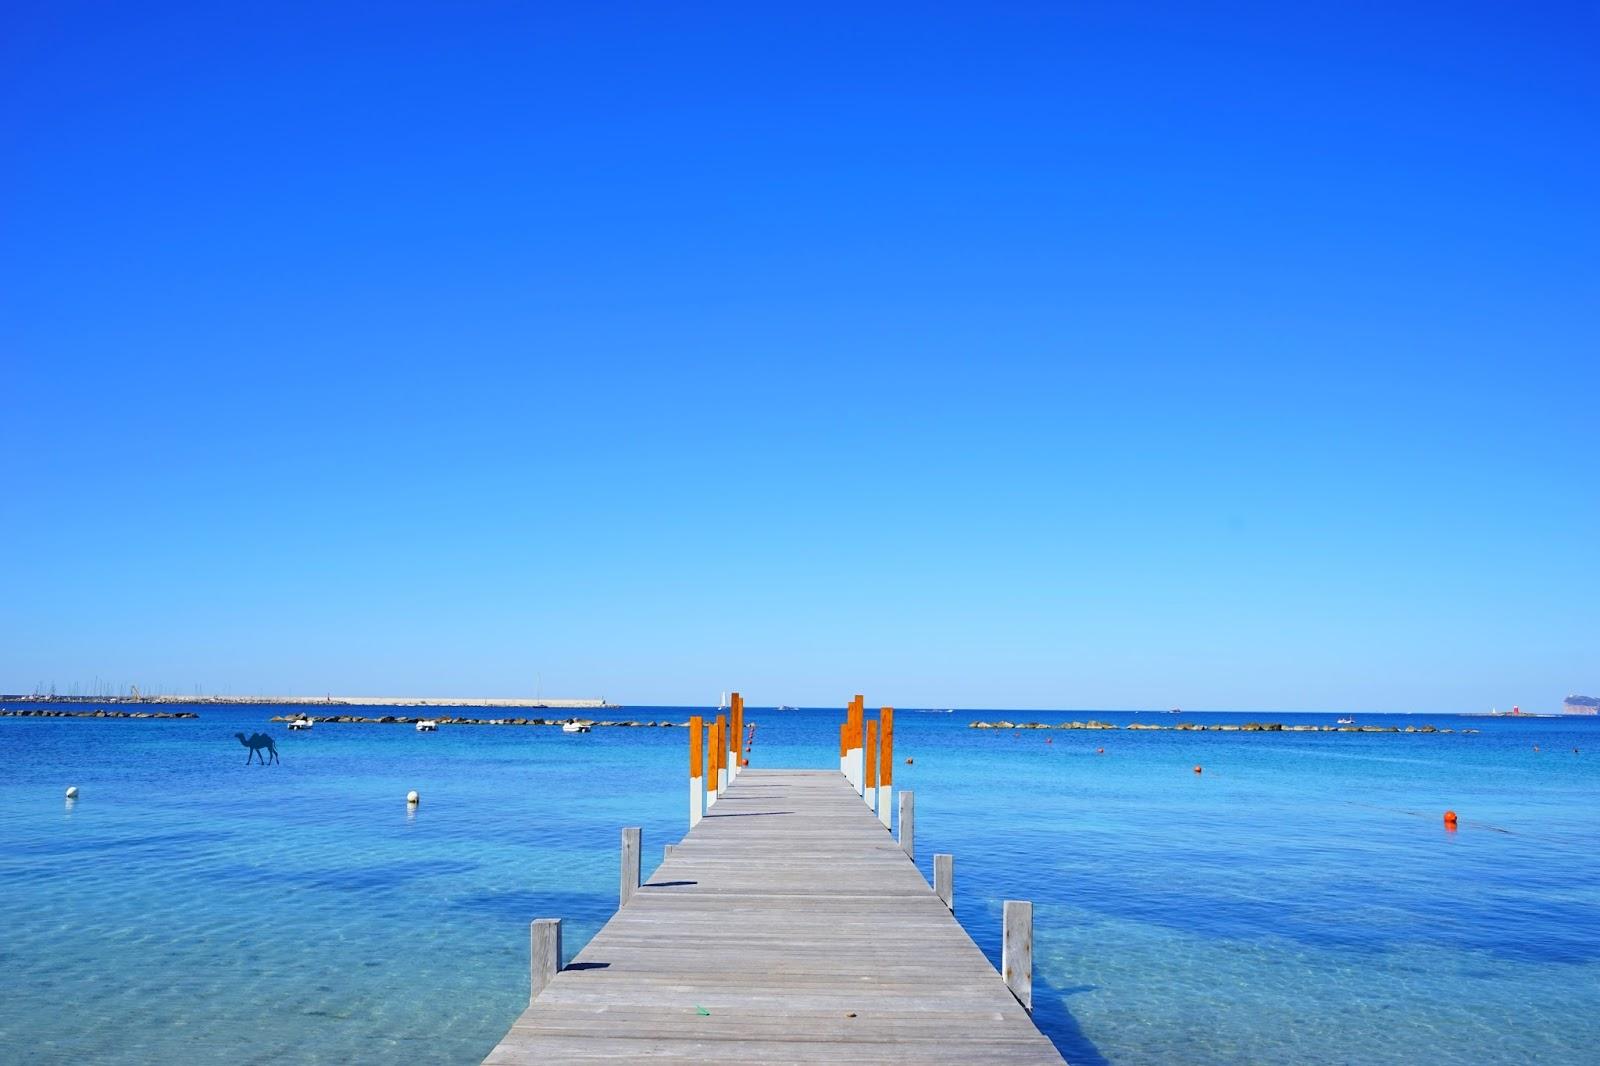 Le Chameau Bleu - Blog Voyage Alghero Sardaigne - Plage d'Alghero Sardaigne - Vacances en Sardaigne